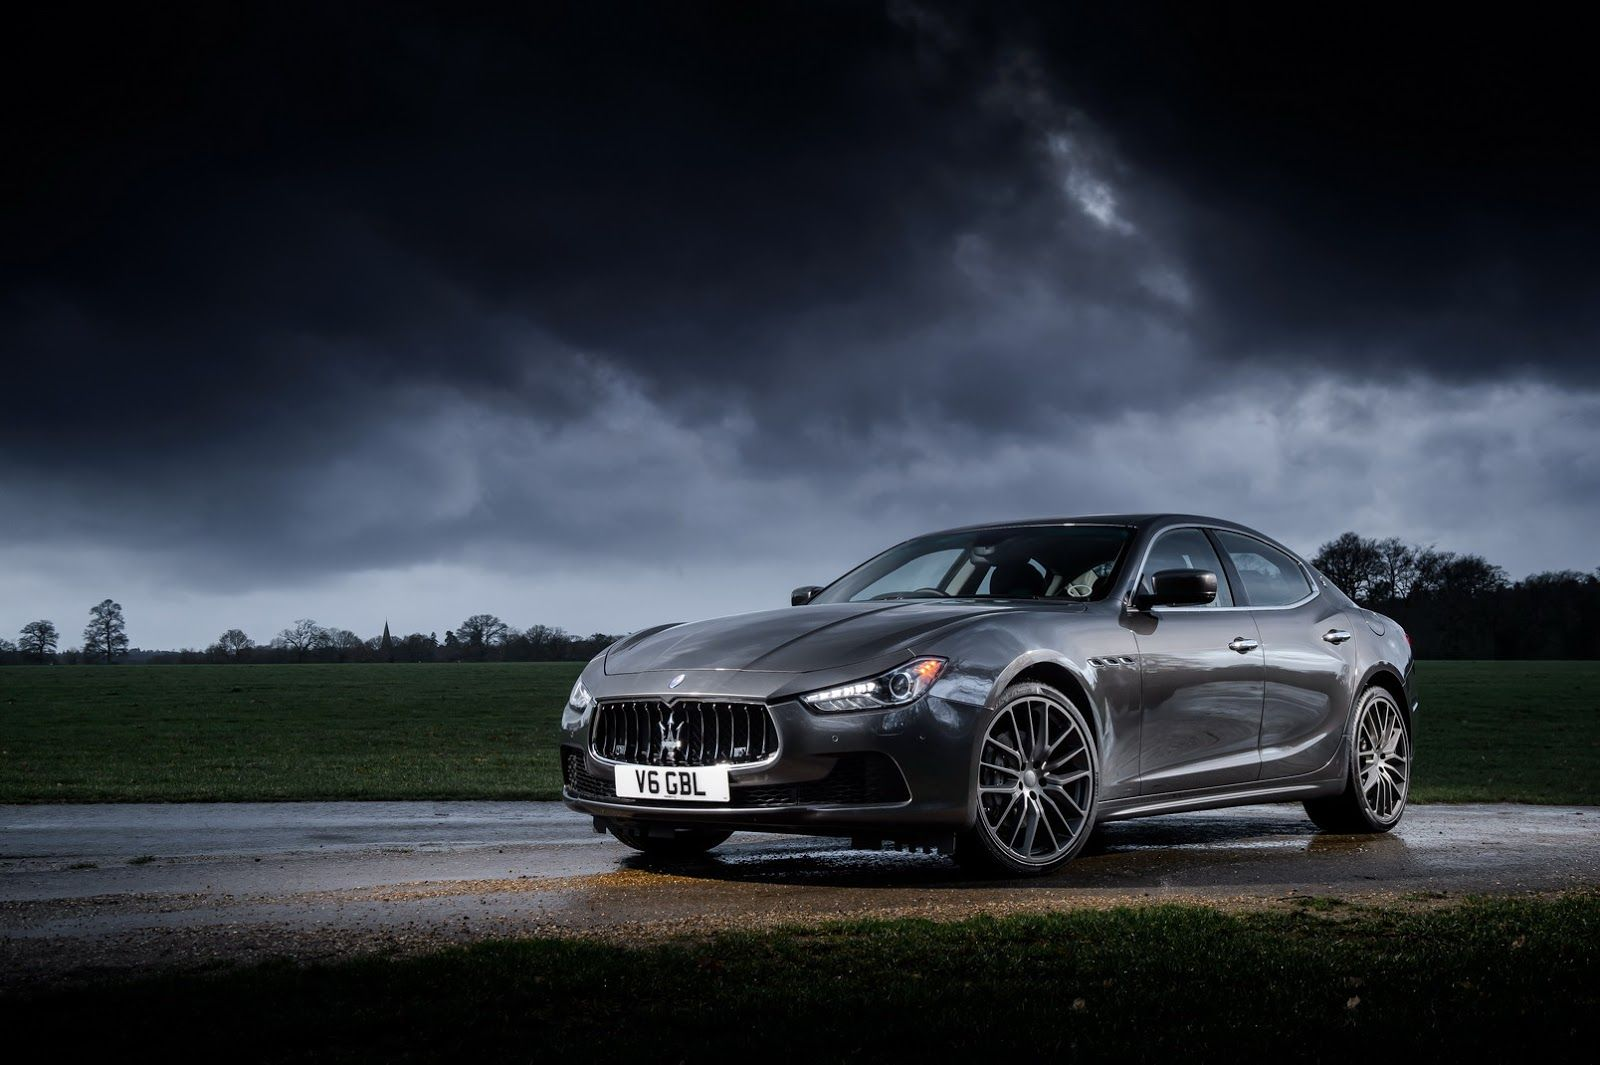 Maserati Ghibli Getting A Nose Job Next Year Maserati Ghibli Maserati Maserati Car